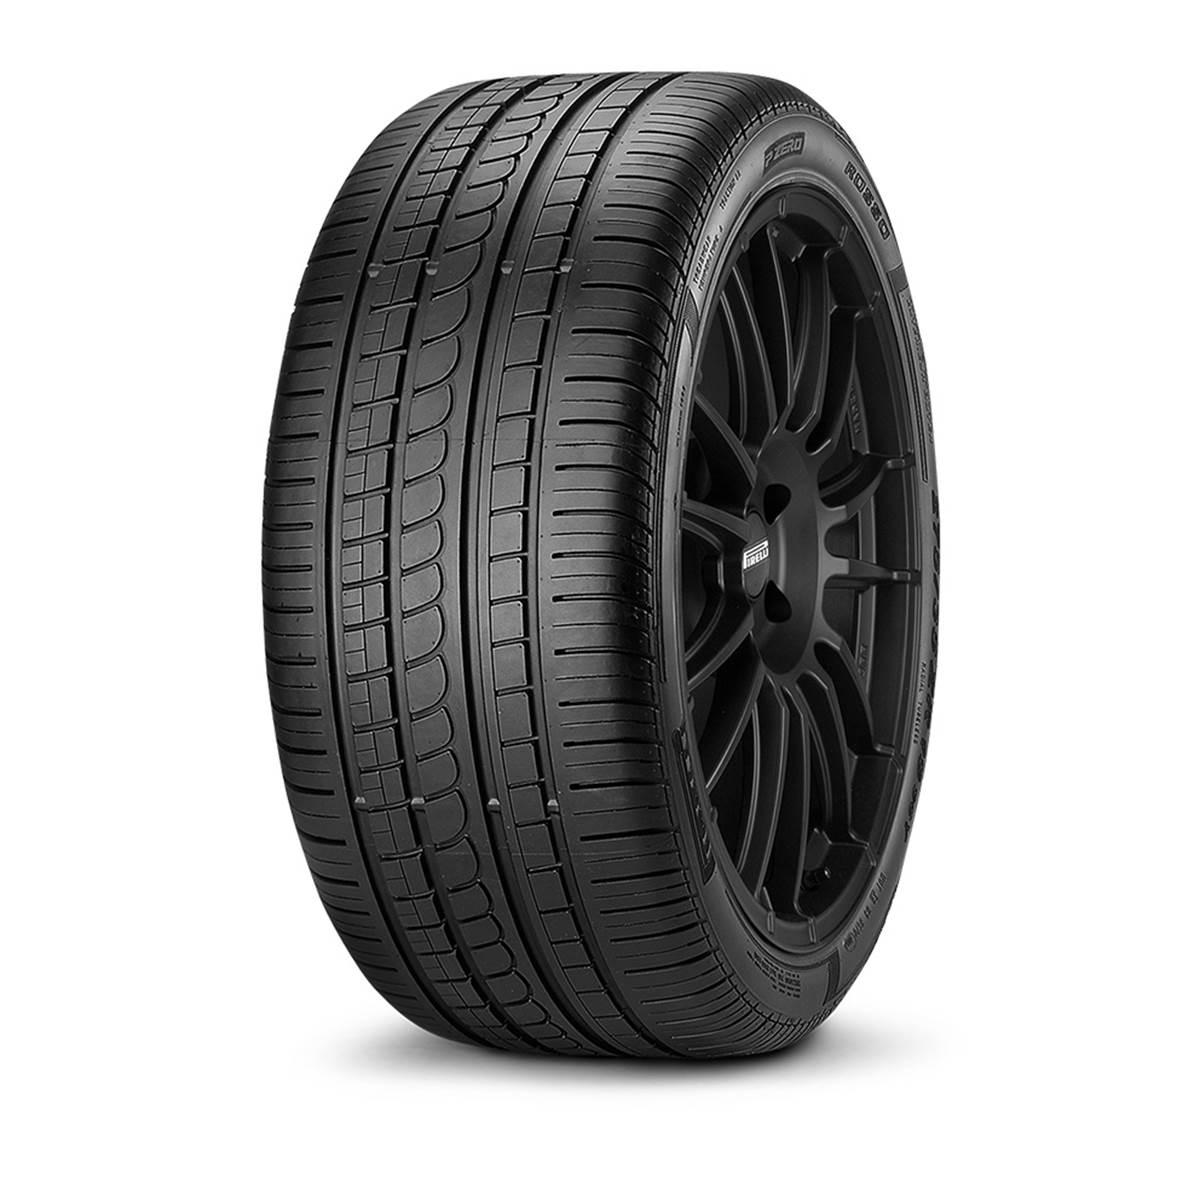 Pneu Pirelli 245/45R18 100Y Pzero Nero (Gt) XL